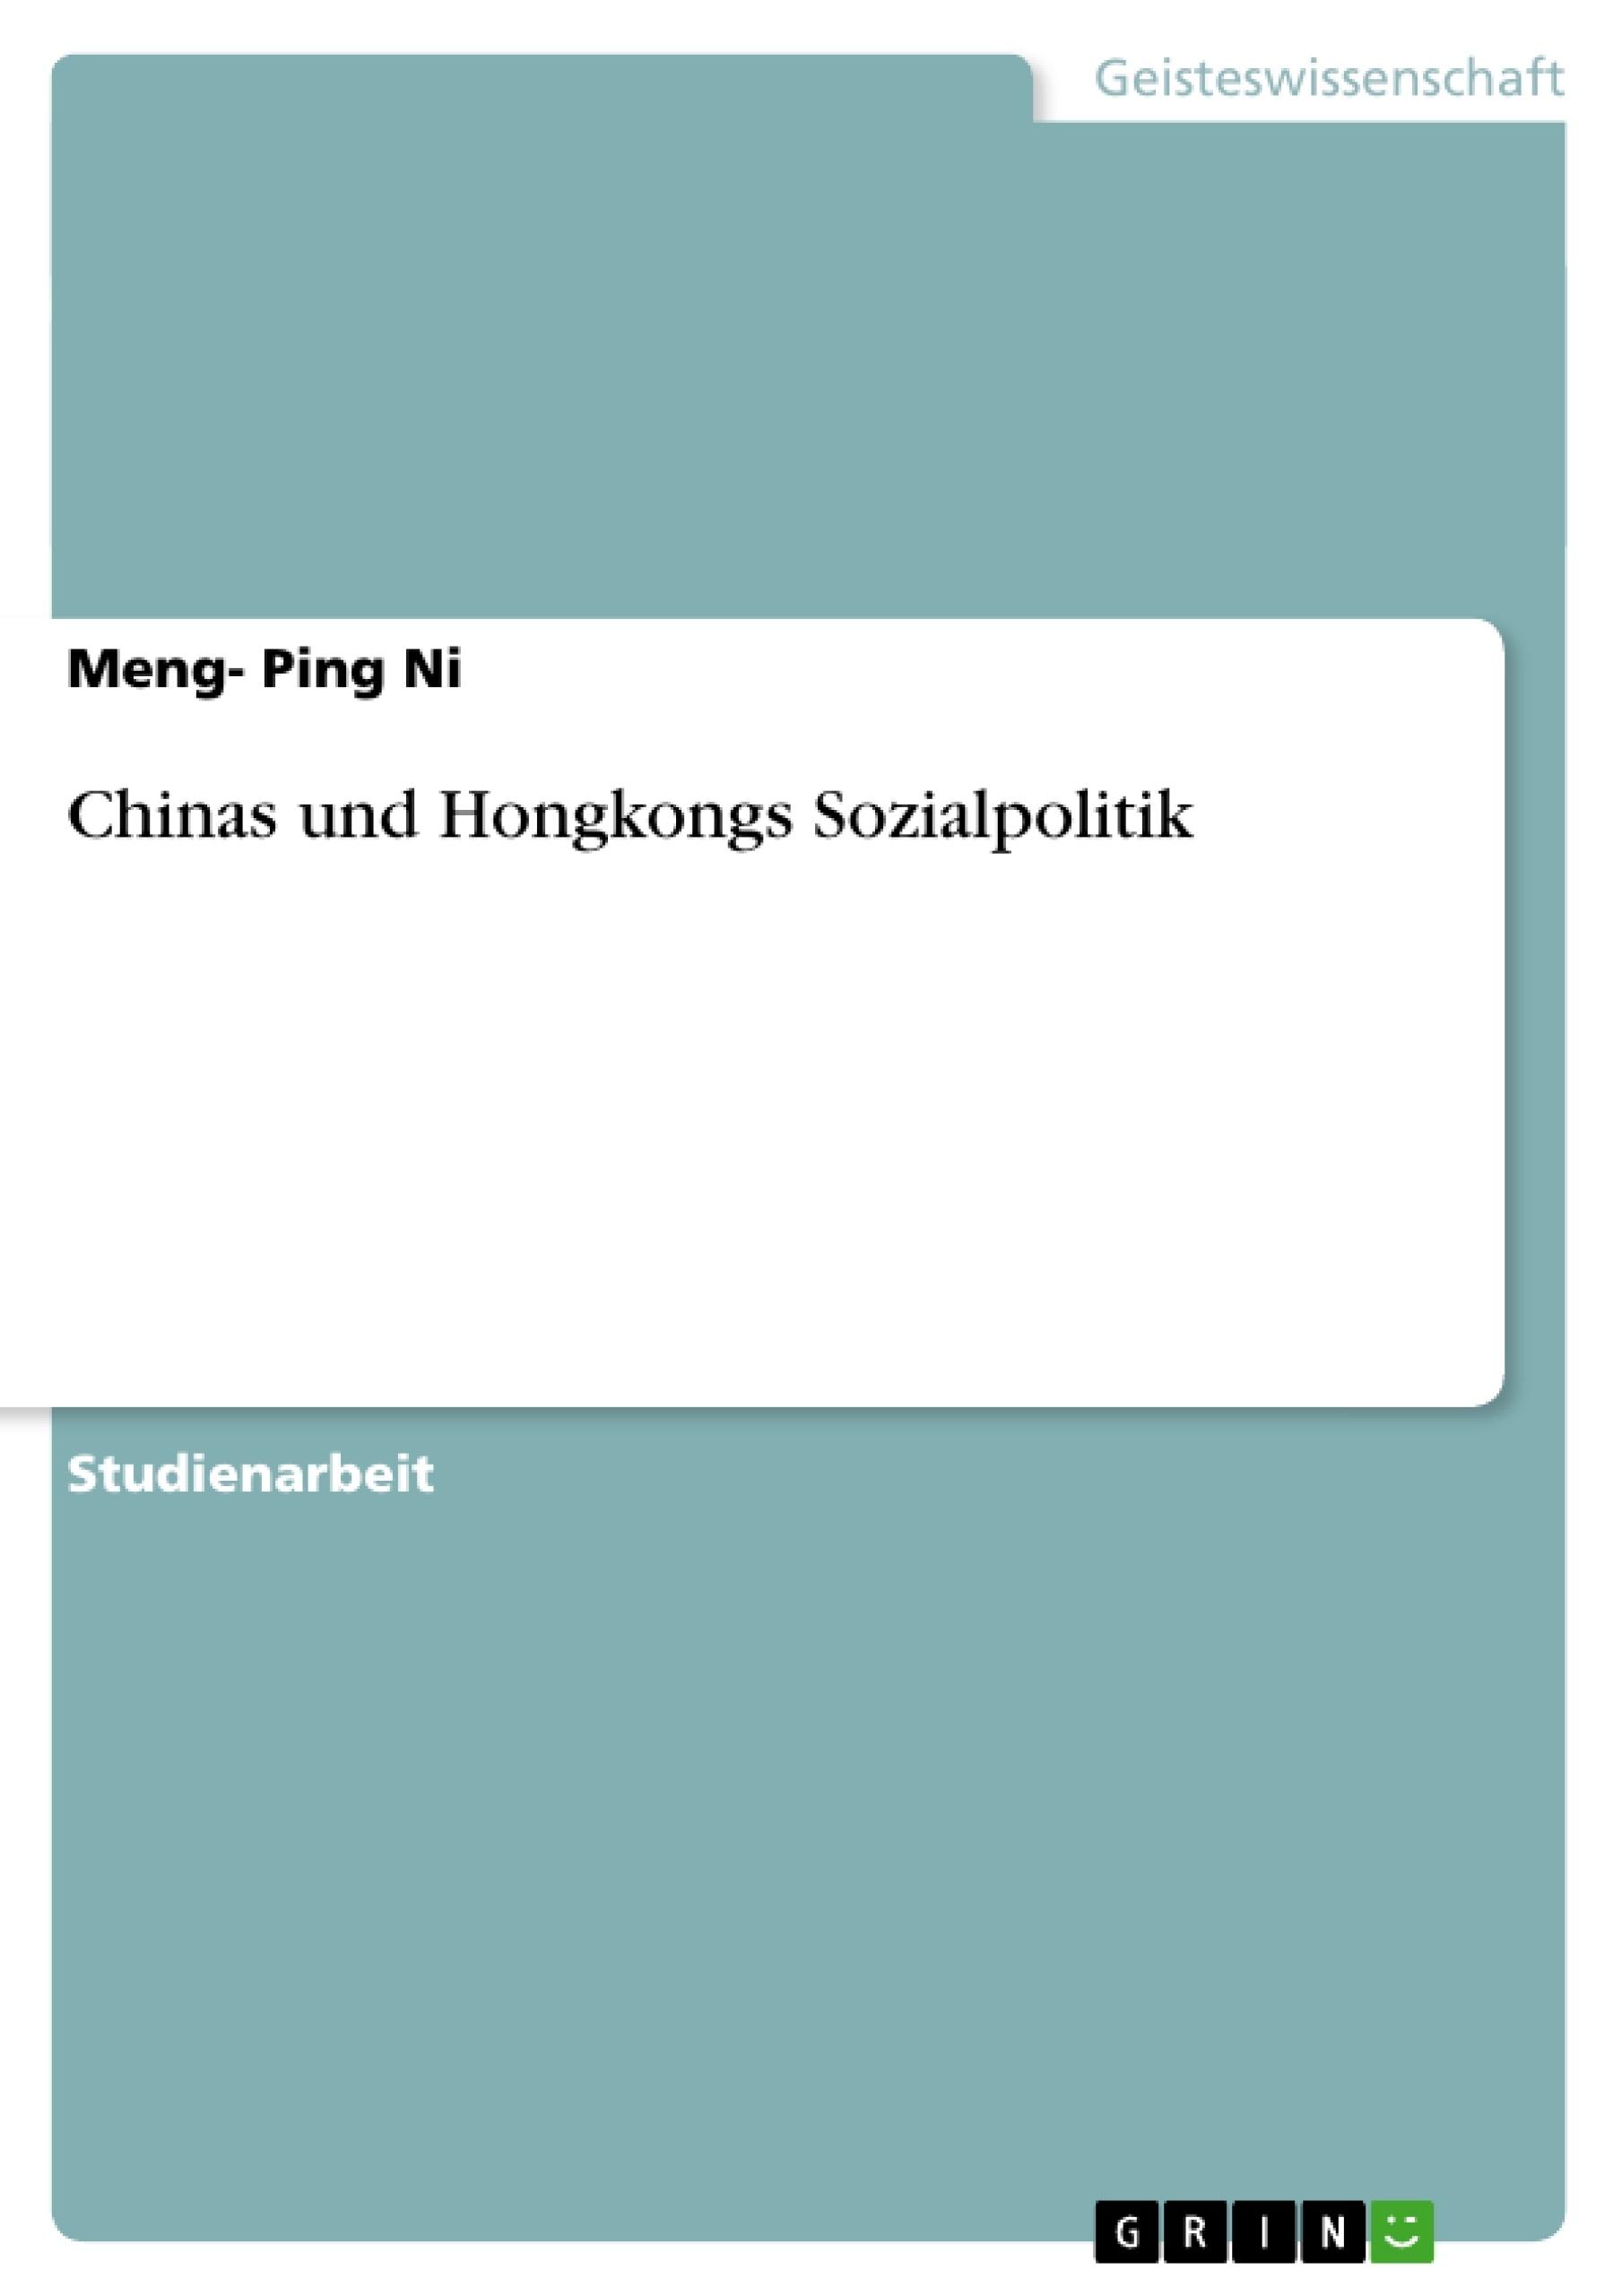 Titel: Chinas und Hongkongs Sozialpolitik